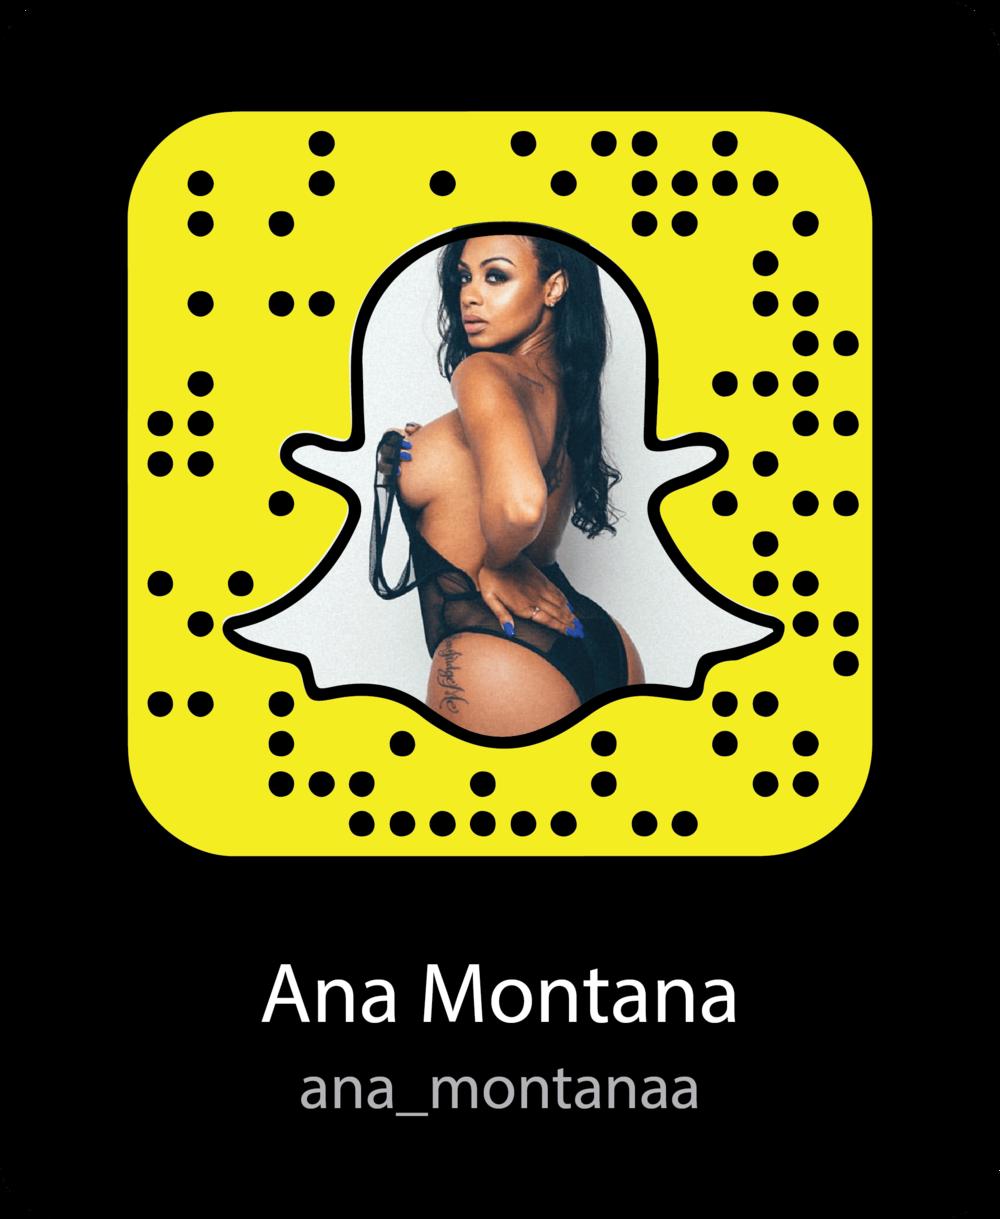 ana-montana-sexy-snapchat-snapcode